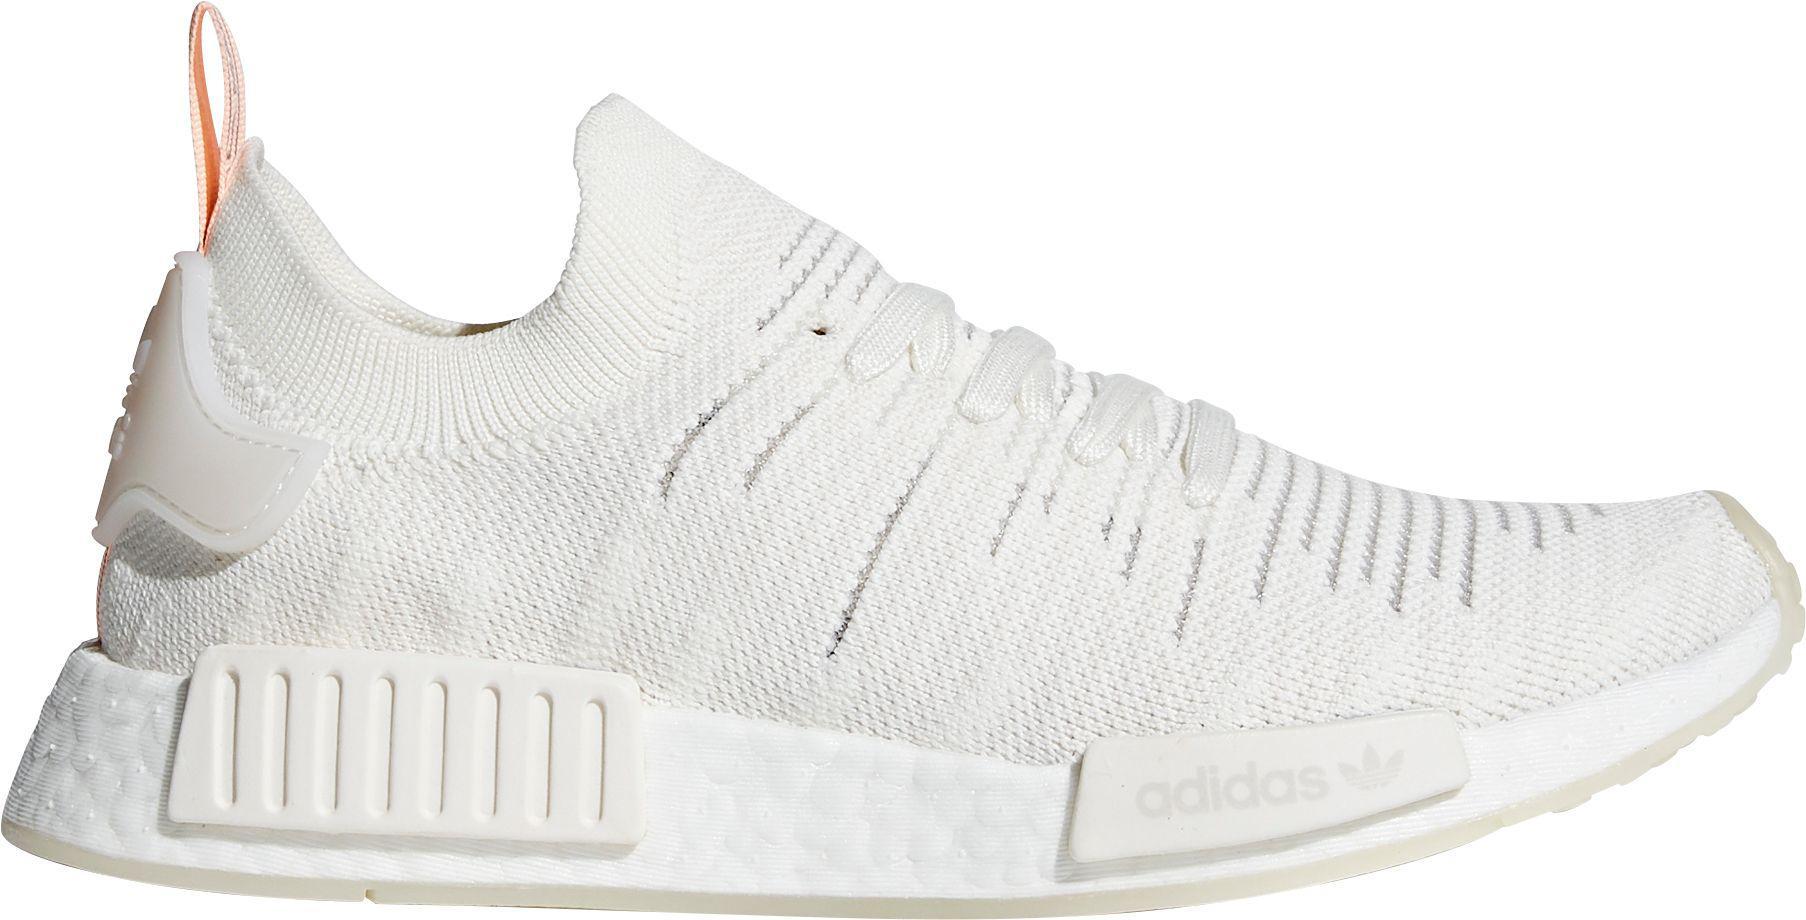 54961176f5868 Lyst - adidas Originals Nmd r1 Stlt Primeknit Shoes in White